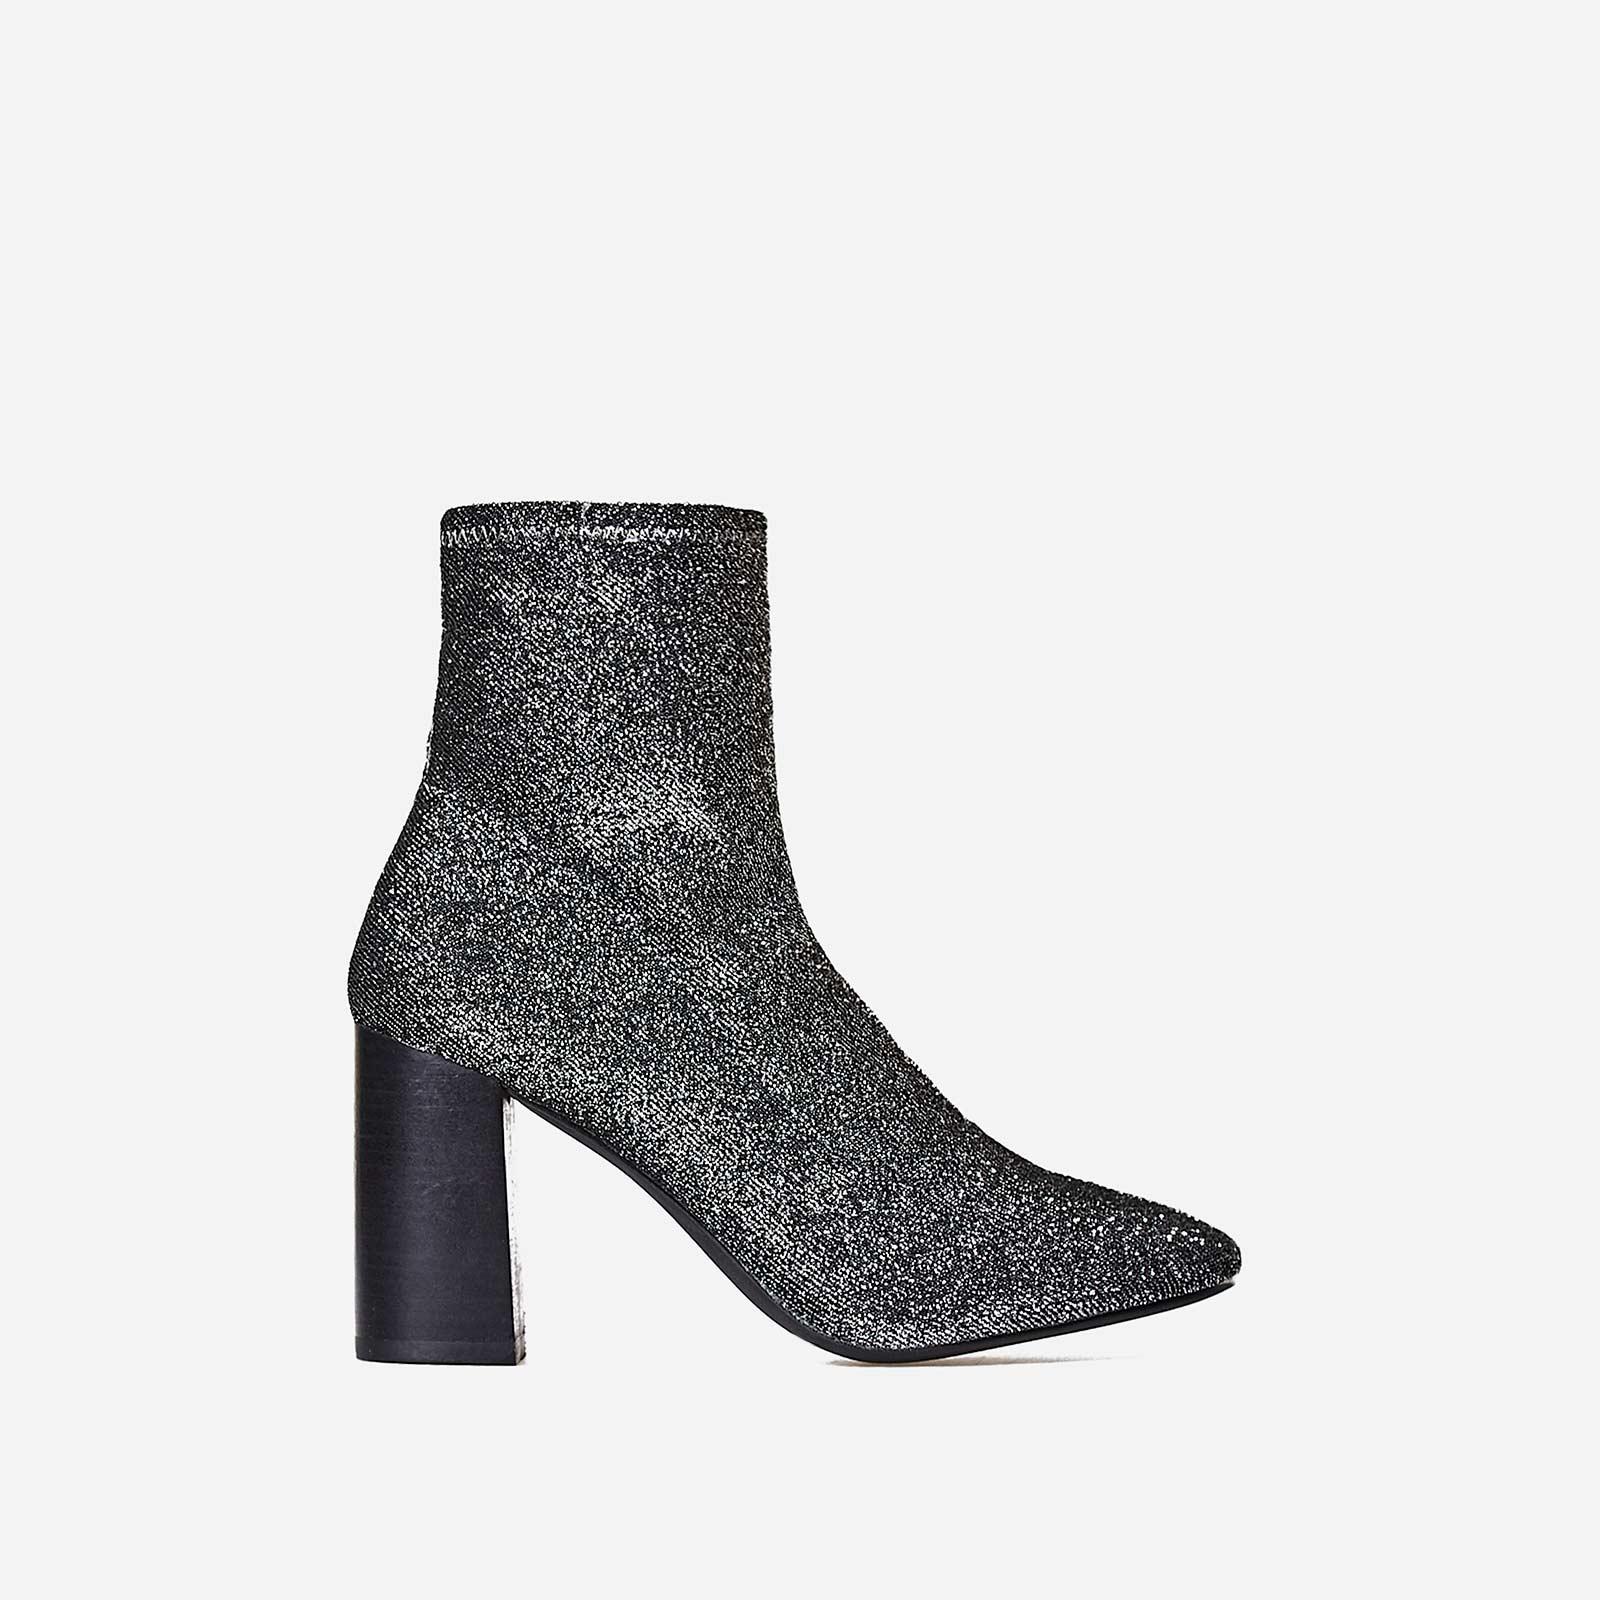 Electra Block Heel Ankle Boot In Metallic Silver Knit